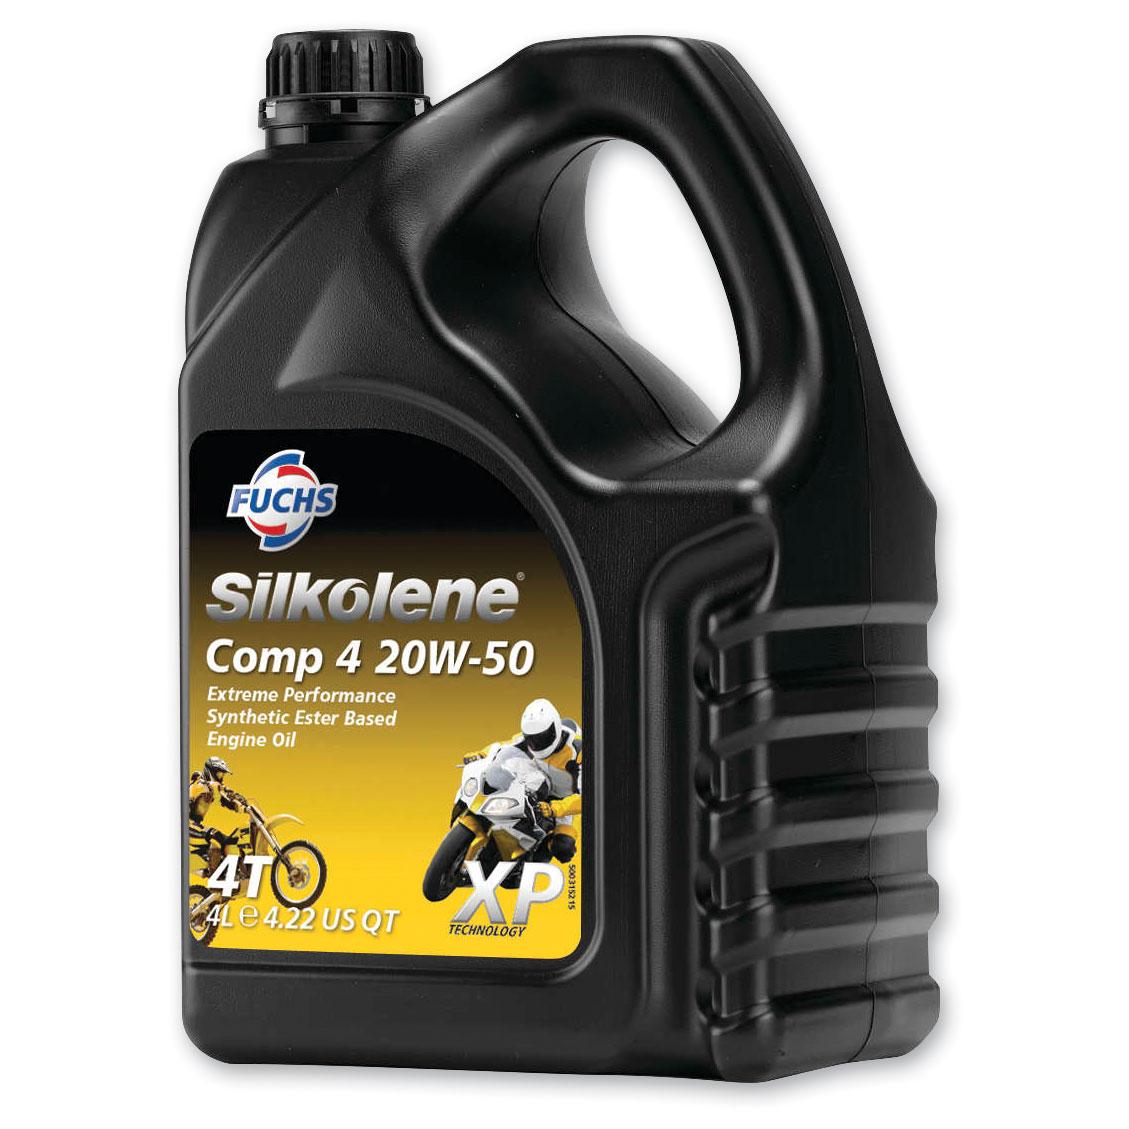 Silkolene Comp 4 XP 20W50 Engine Oil 4L